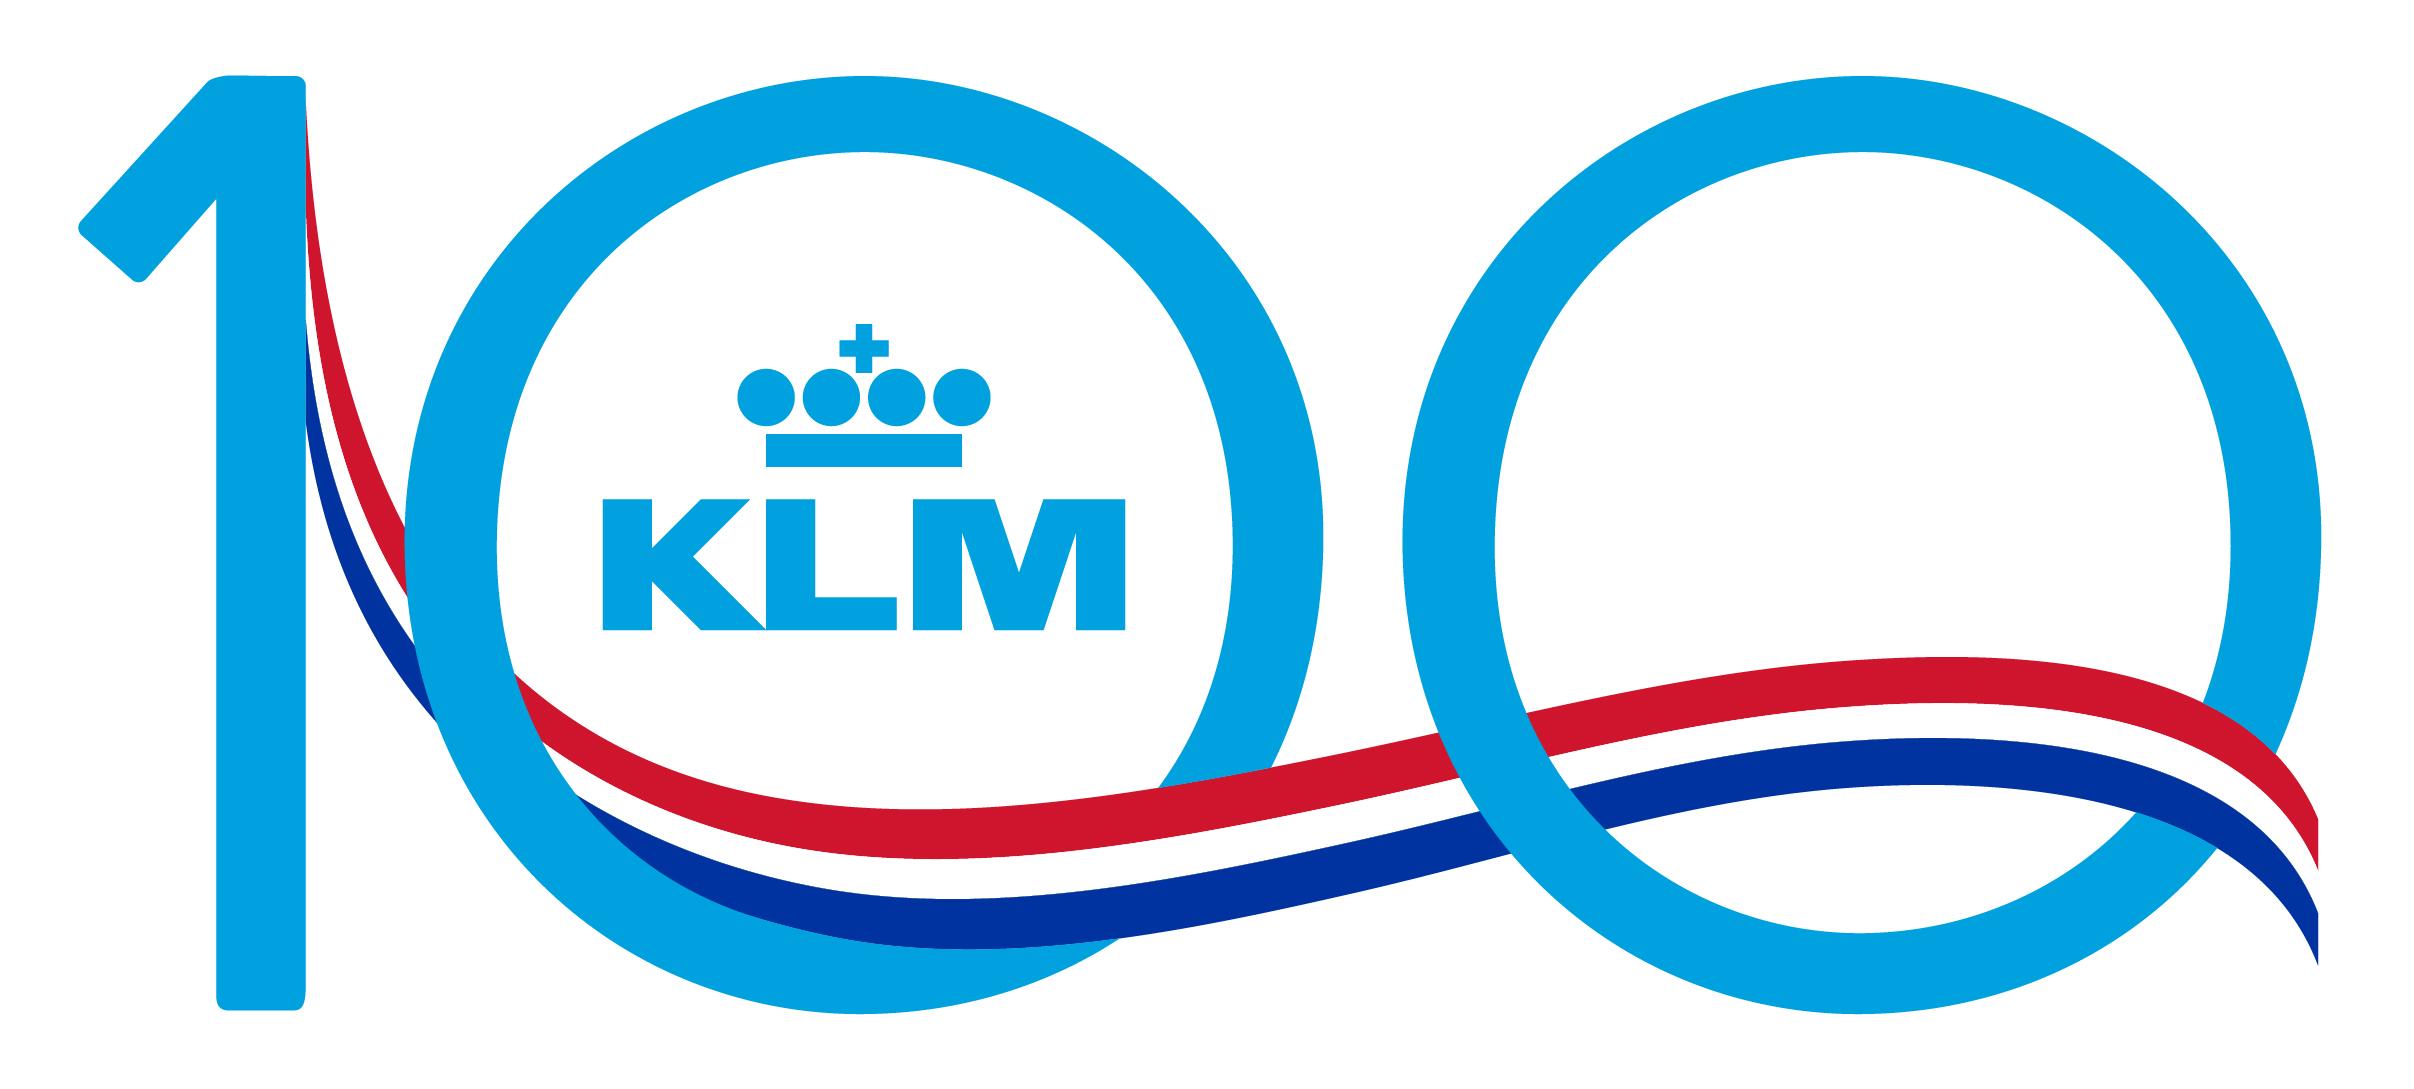 KLM 100: celebrate the future.